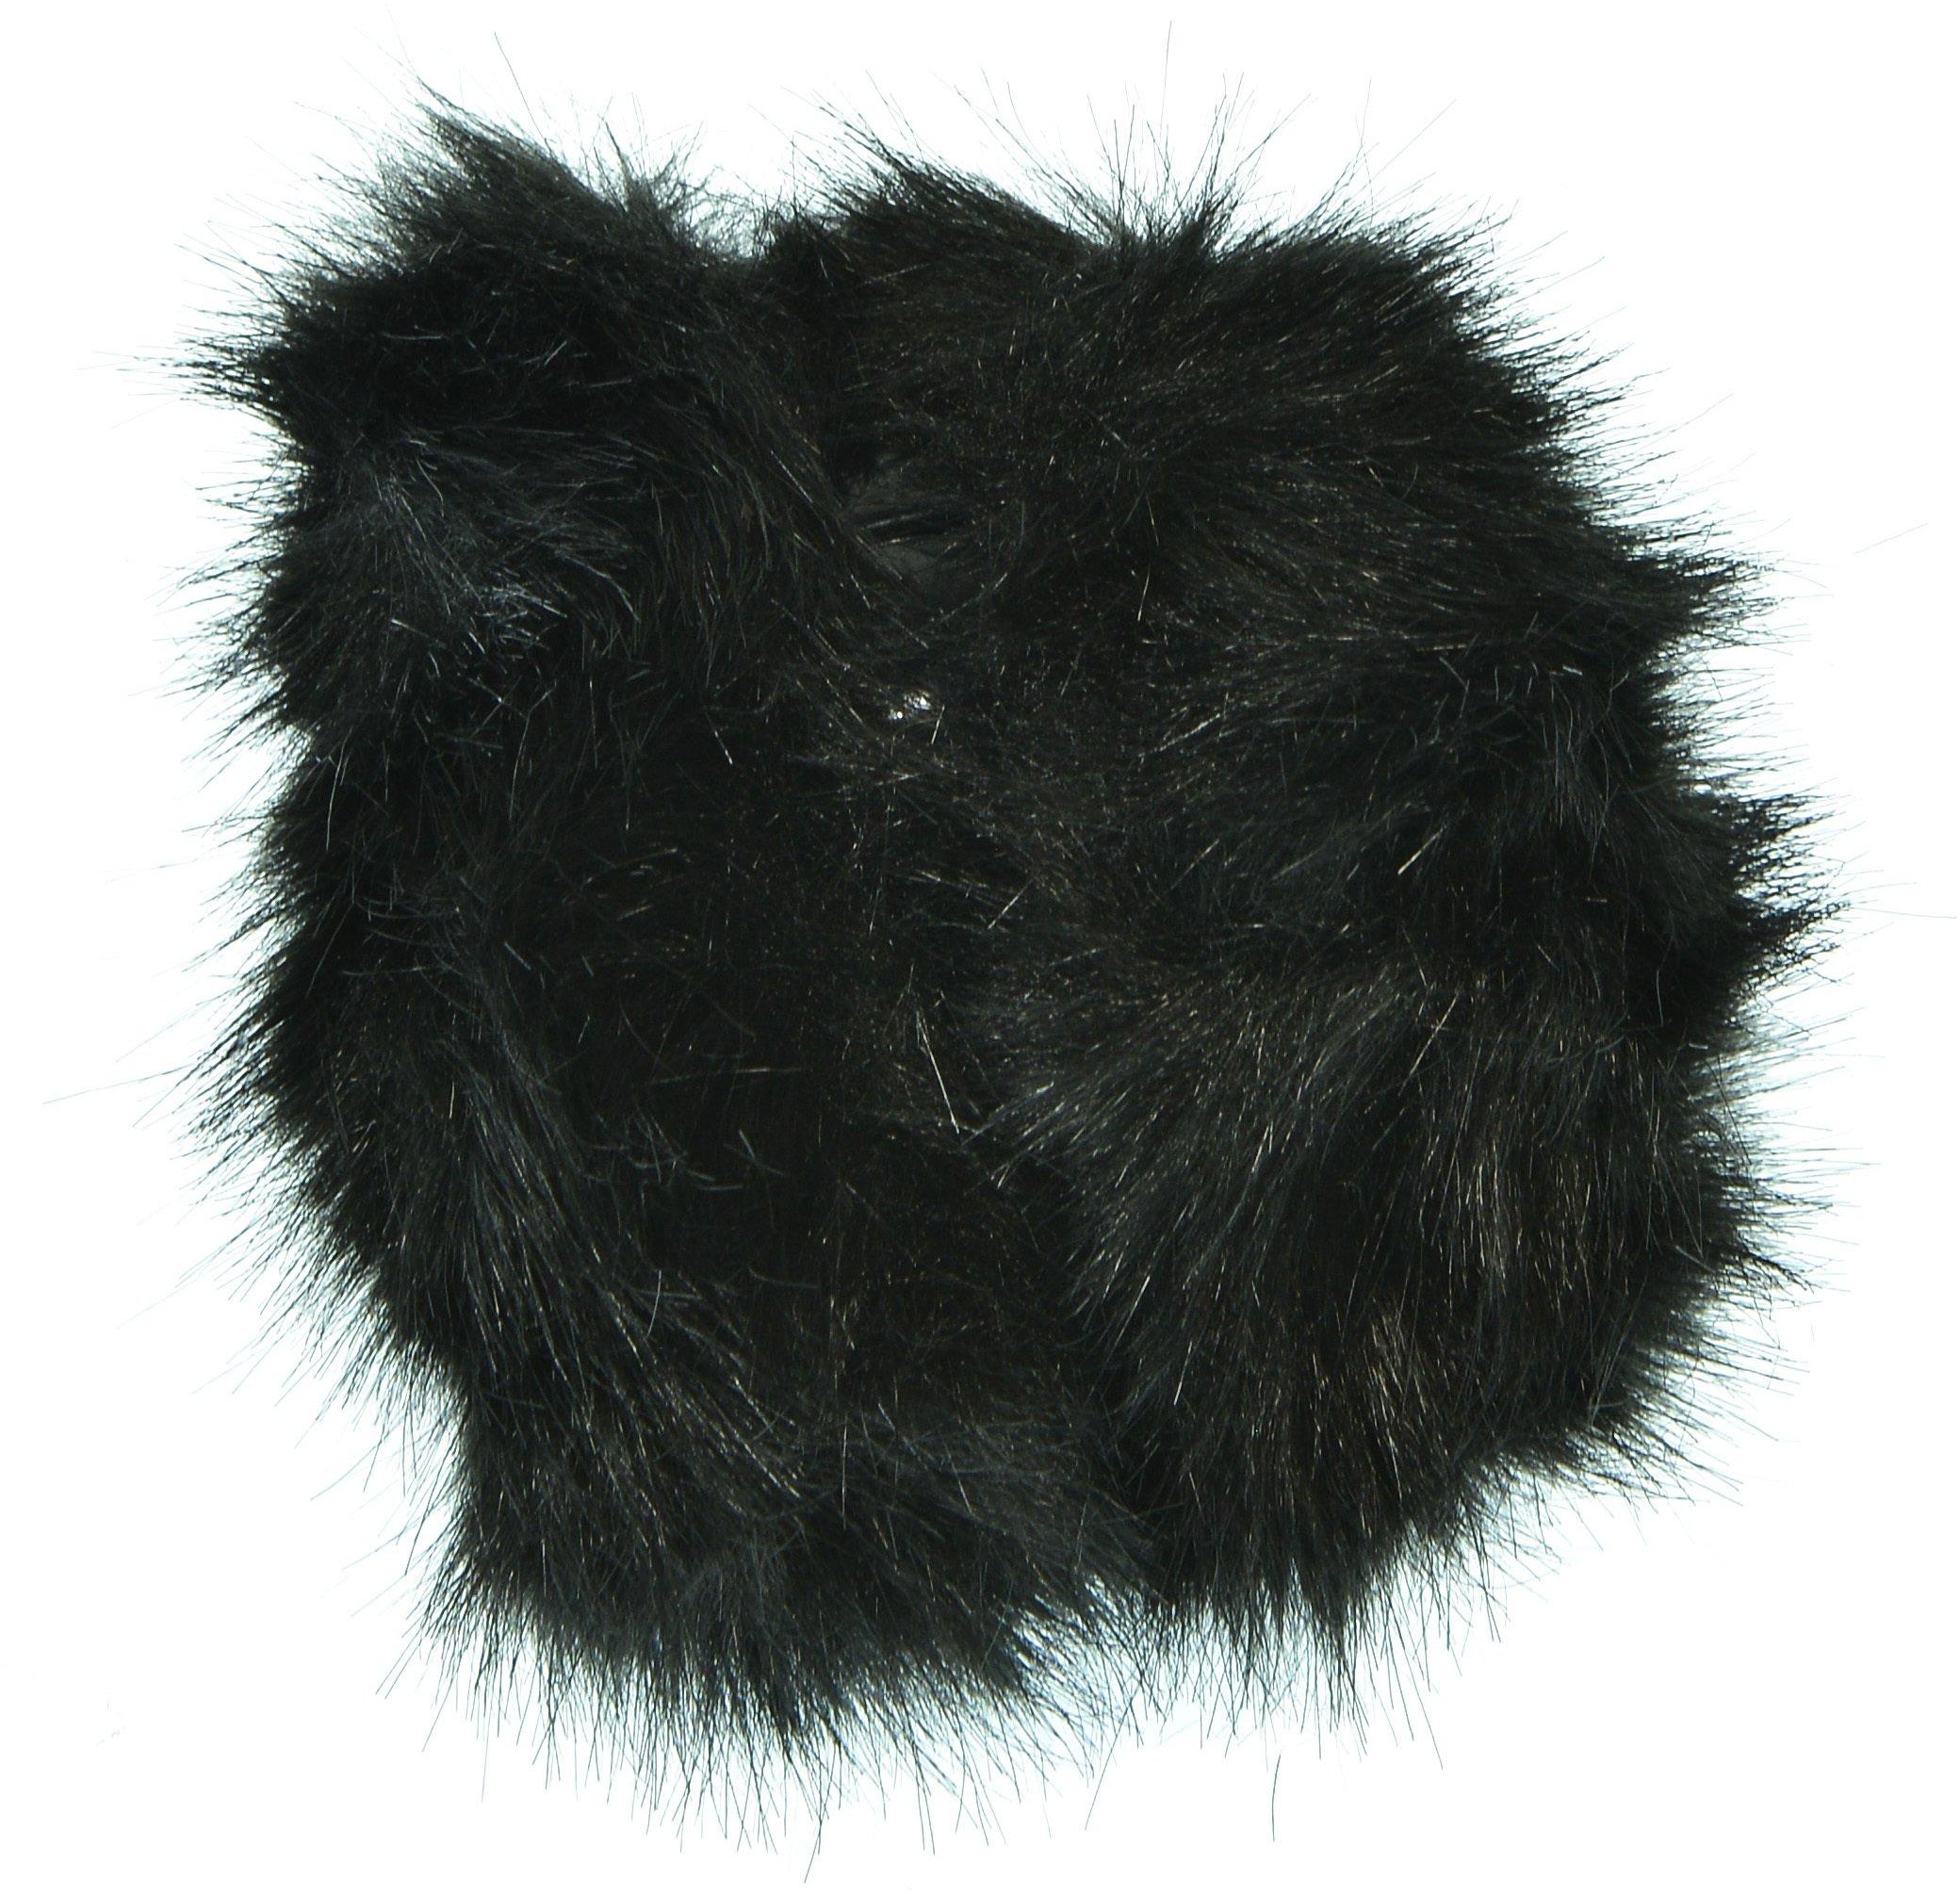 Hand By Hand Aprileo Unisex Twist Adjuster Earmuff Ear Warmer Faux Fur Soft Fuzzy [Black.](One Size)